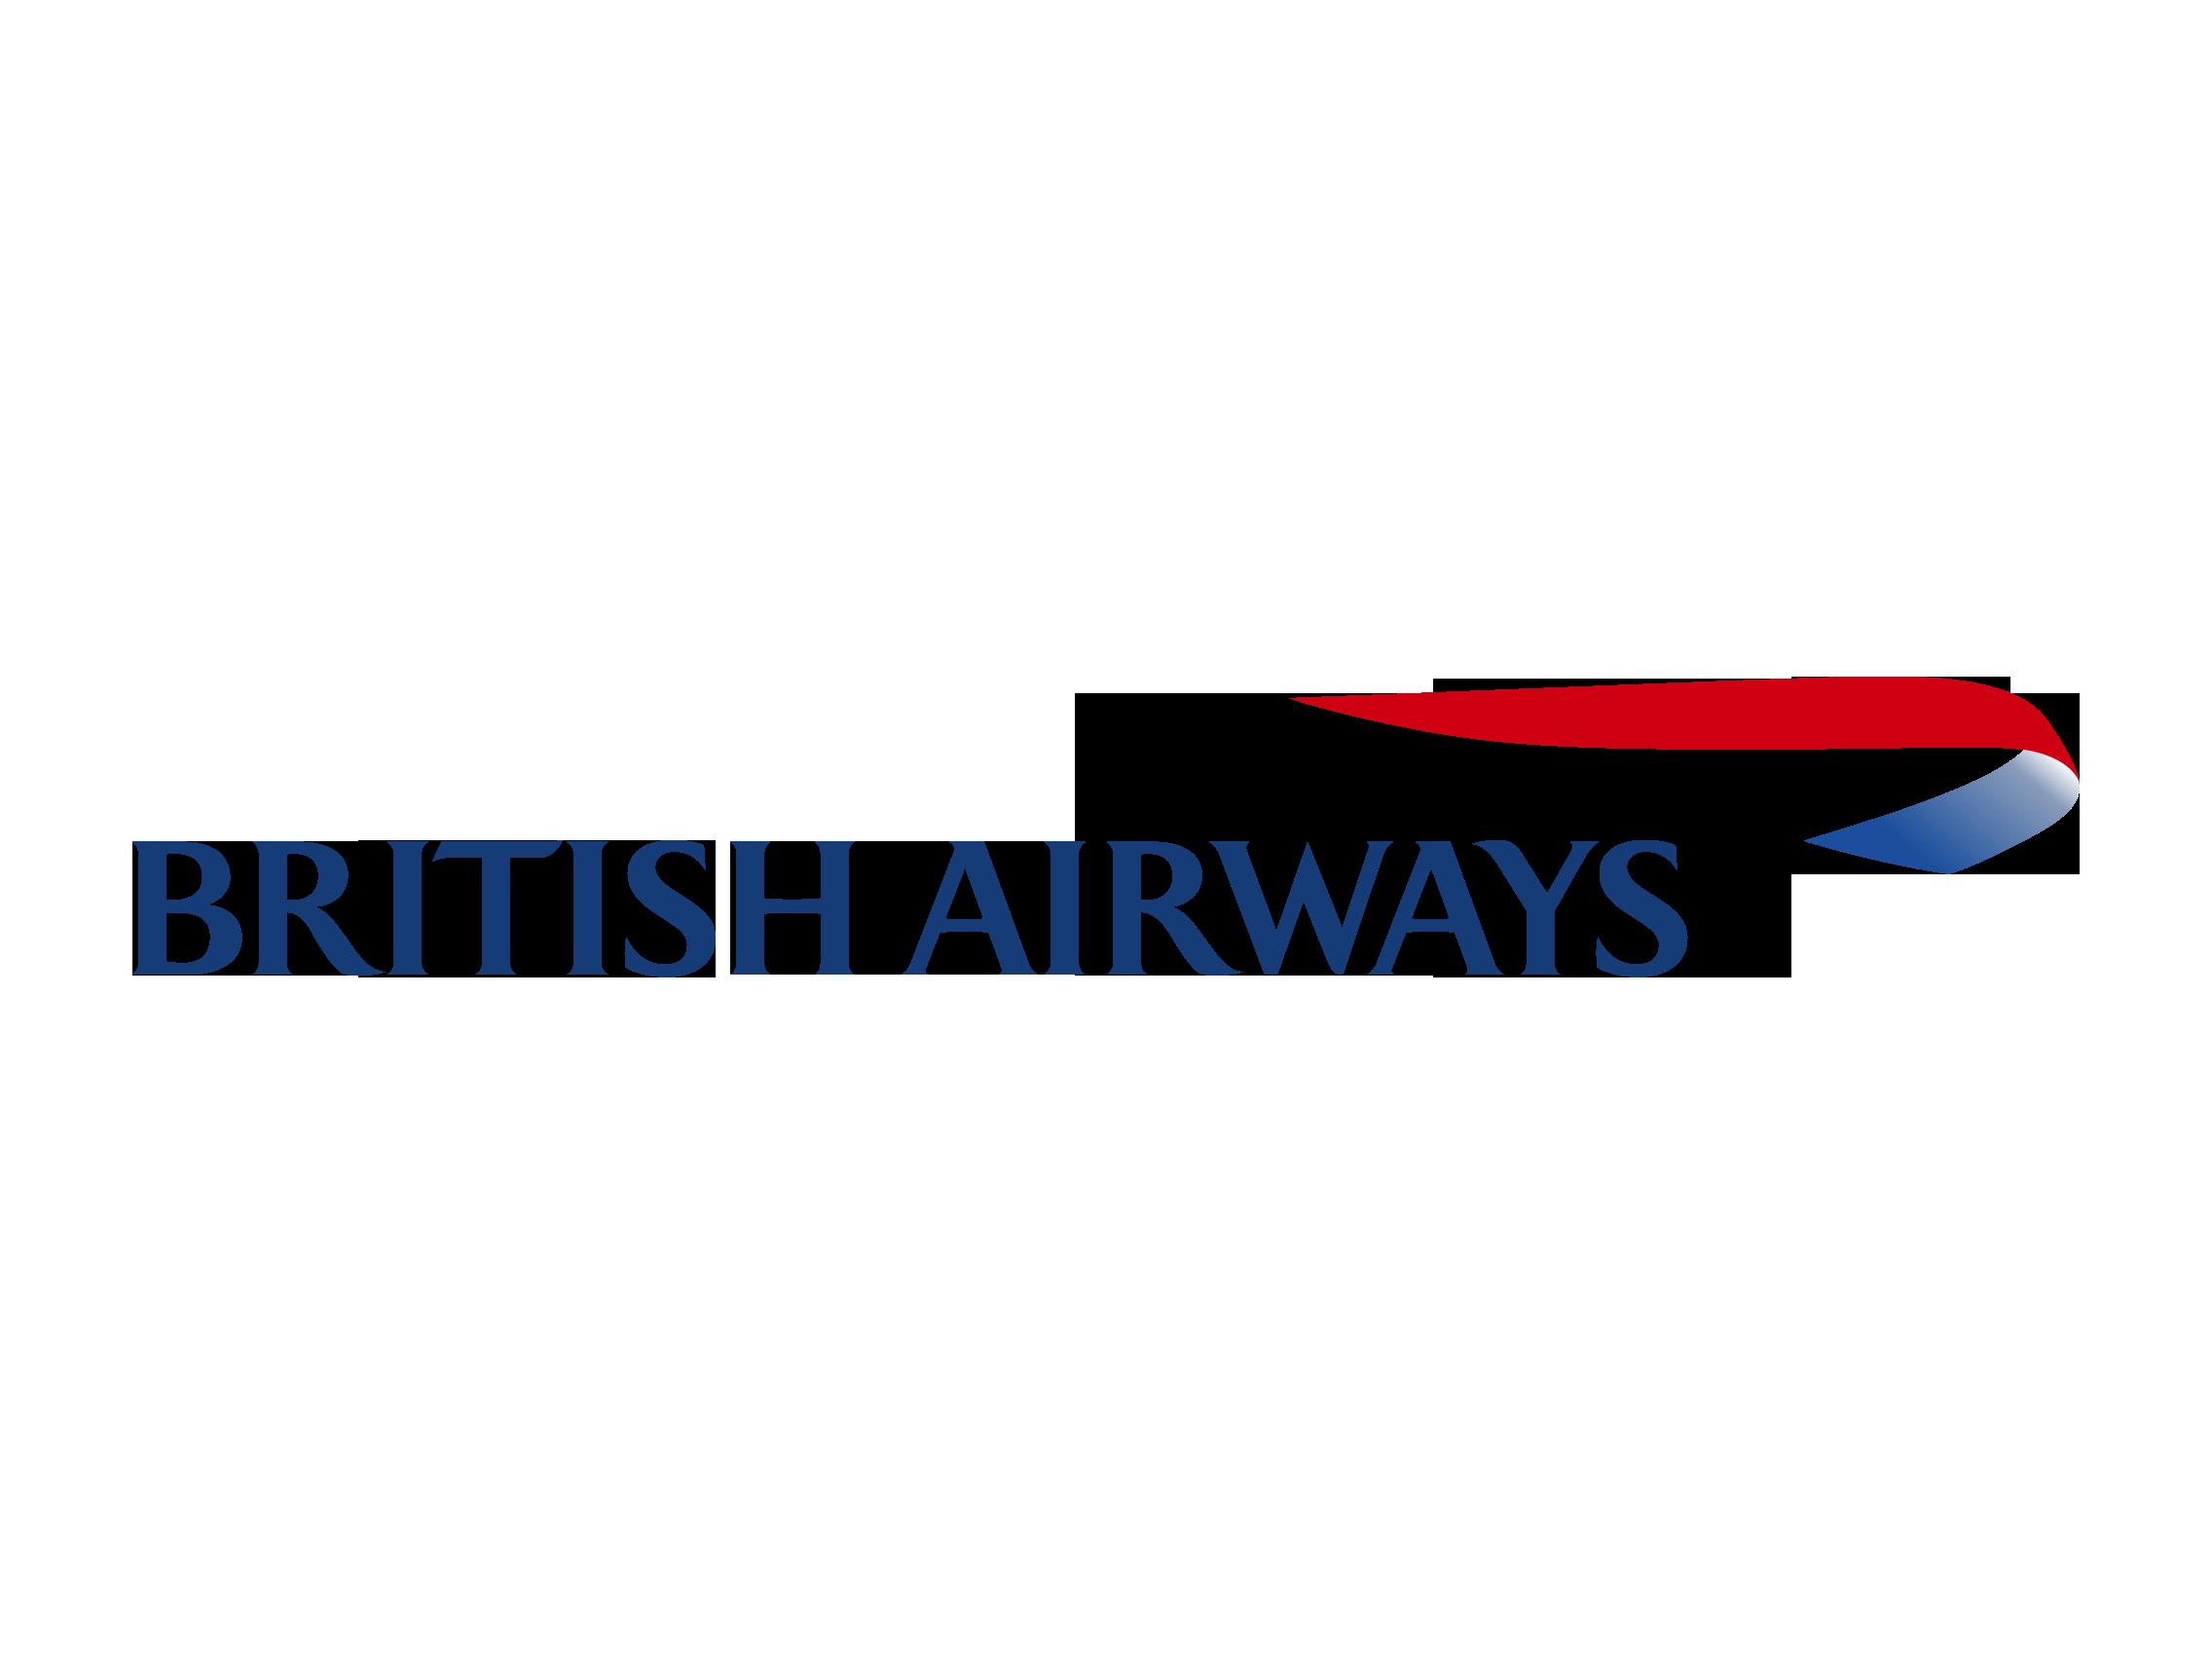 British airways png ba. Grocery clipart logo supermarket